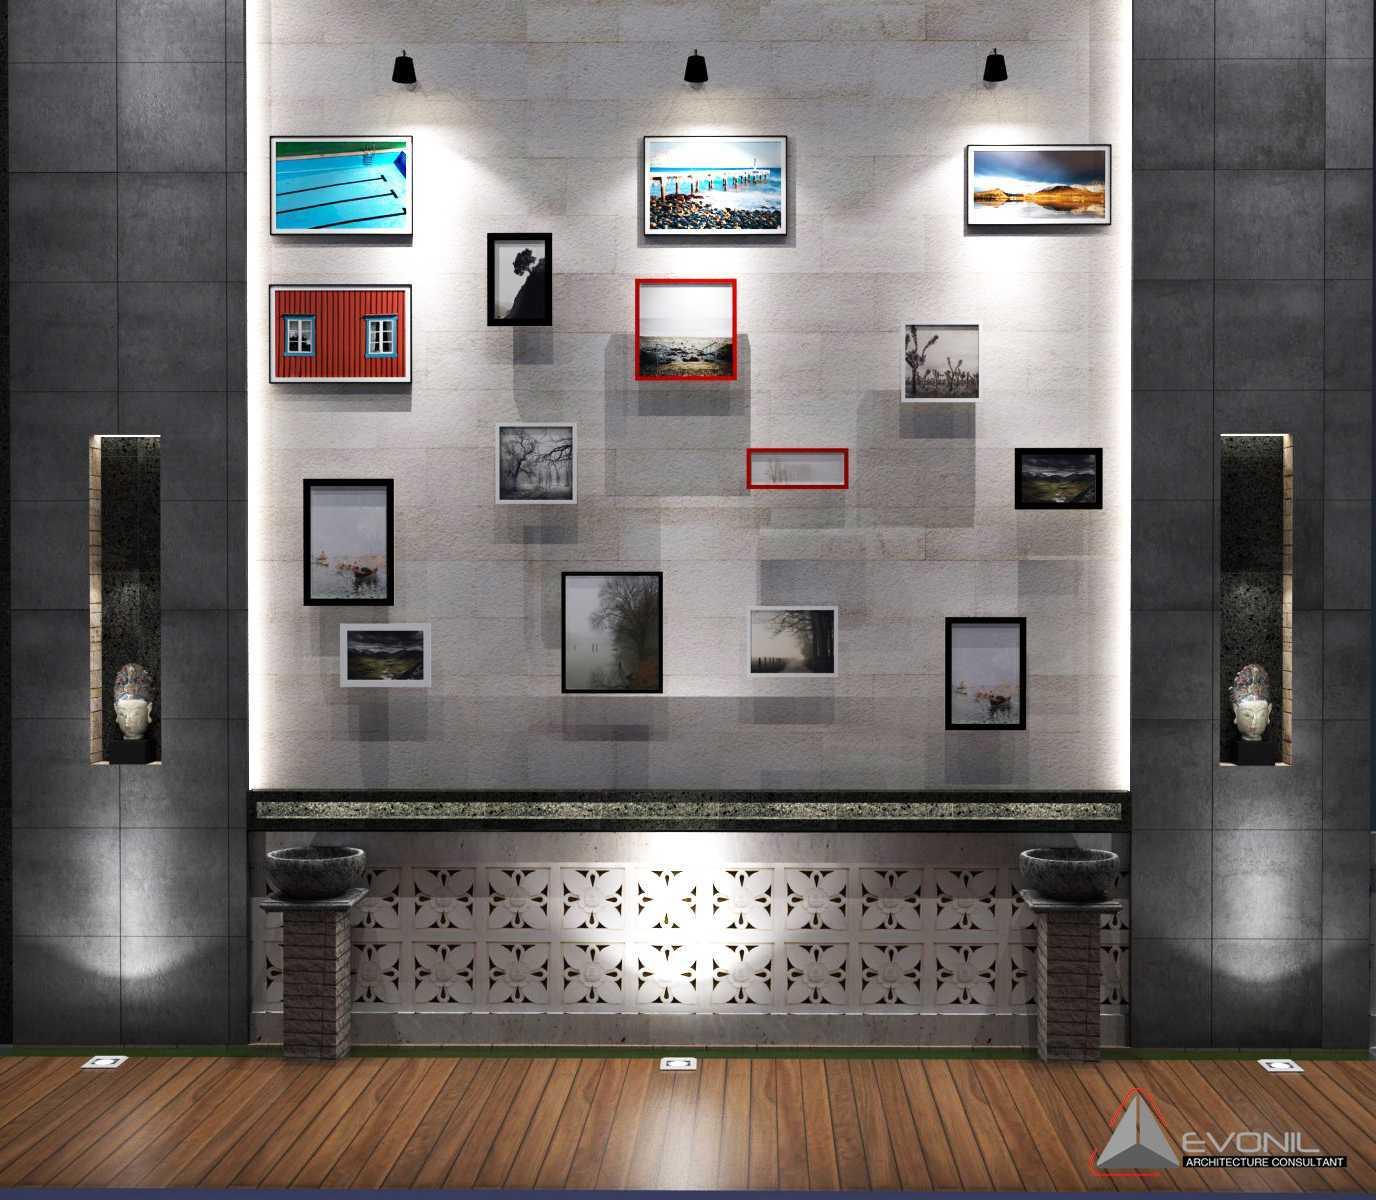 Evonil Architecture Residence Jatiwaringin Jatiwaringin, Jakarta Jatiwaringin, Jakarta Lorong-1-Rev Tradisional 13070